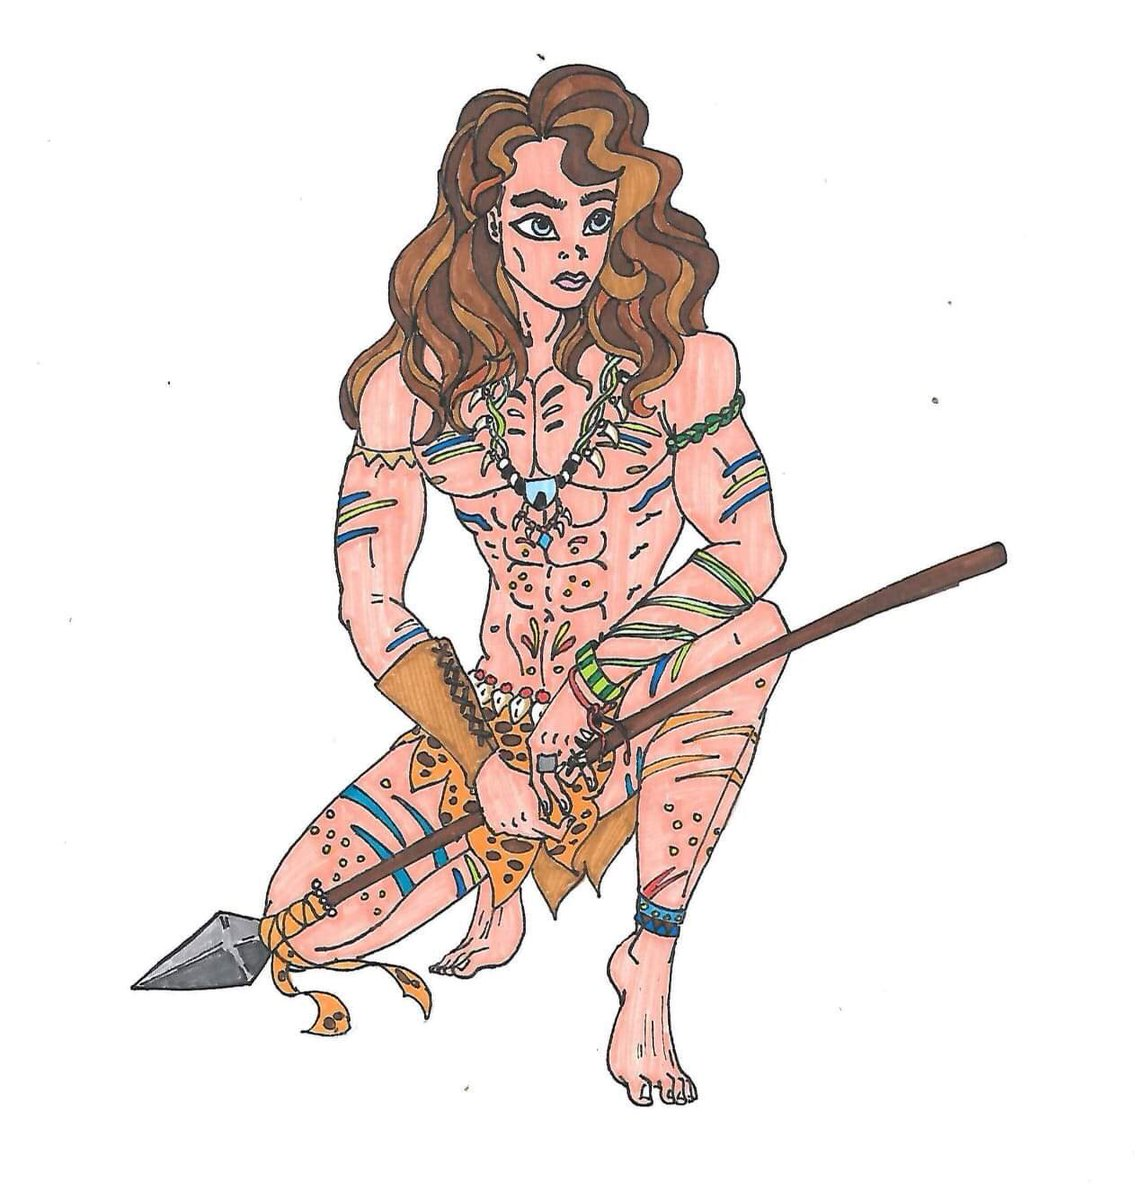 Introducing Christopher Clayton (wild version), son of Tarzan & Jane.  #inktober2019 #wild #sketch #sketchbook #sketching #sketchdaily #draw #drawing #drawingoftheday #art #arte #artwork #artistsoninstagram #characterdesign #originalcharacter #tarzan #princevanyapic.twitter.com/nTjR74rNS5